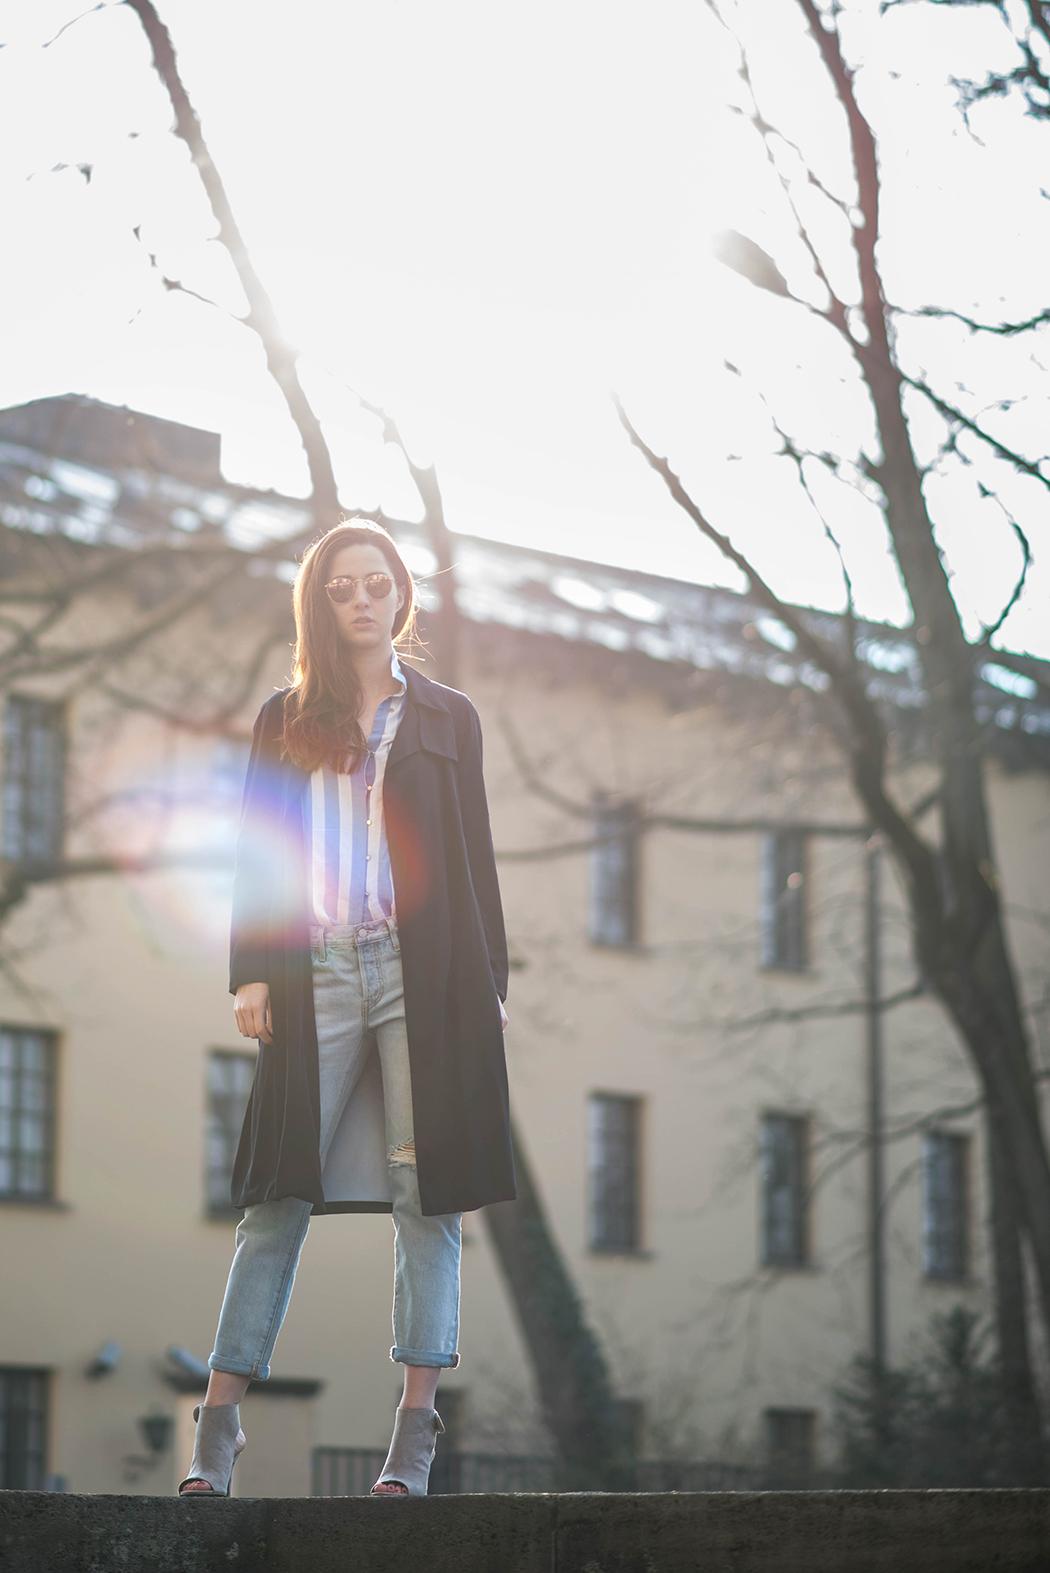 Fashionblogger-Deutschland-Fashionblog-München-Lindarella-Levis-501CT-Marinelook-Ripped-Jeans-Lindarella-2